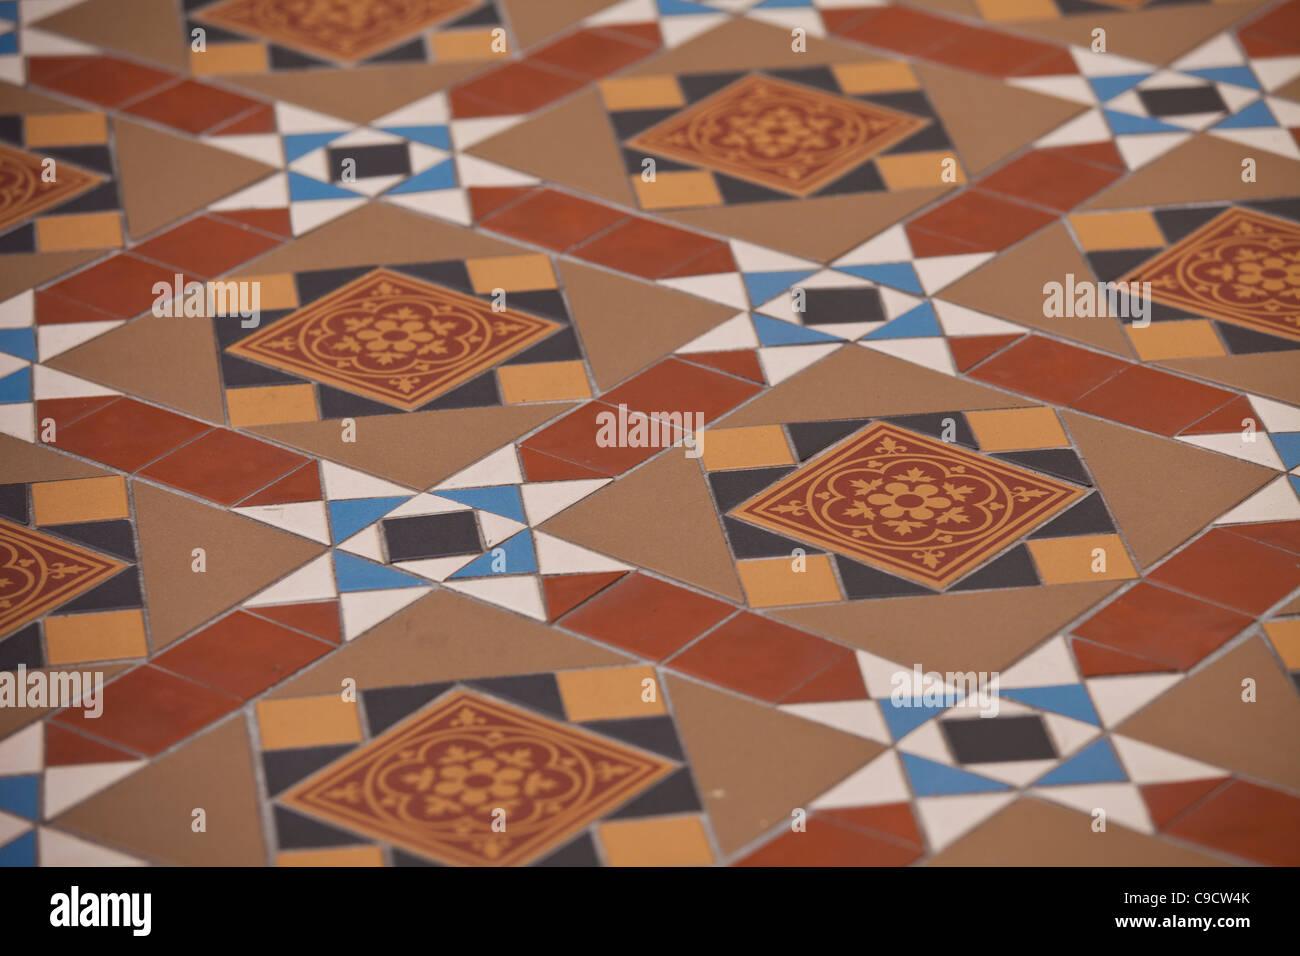 Melbourne Historische Gemusterten Ton Weg Boden Fliesen Gesehen - Fliesen historische muster